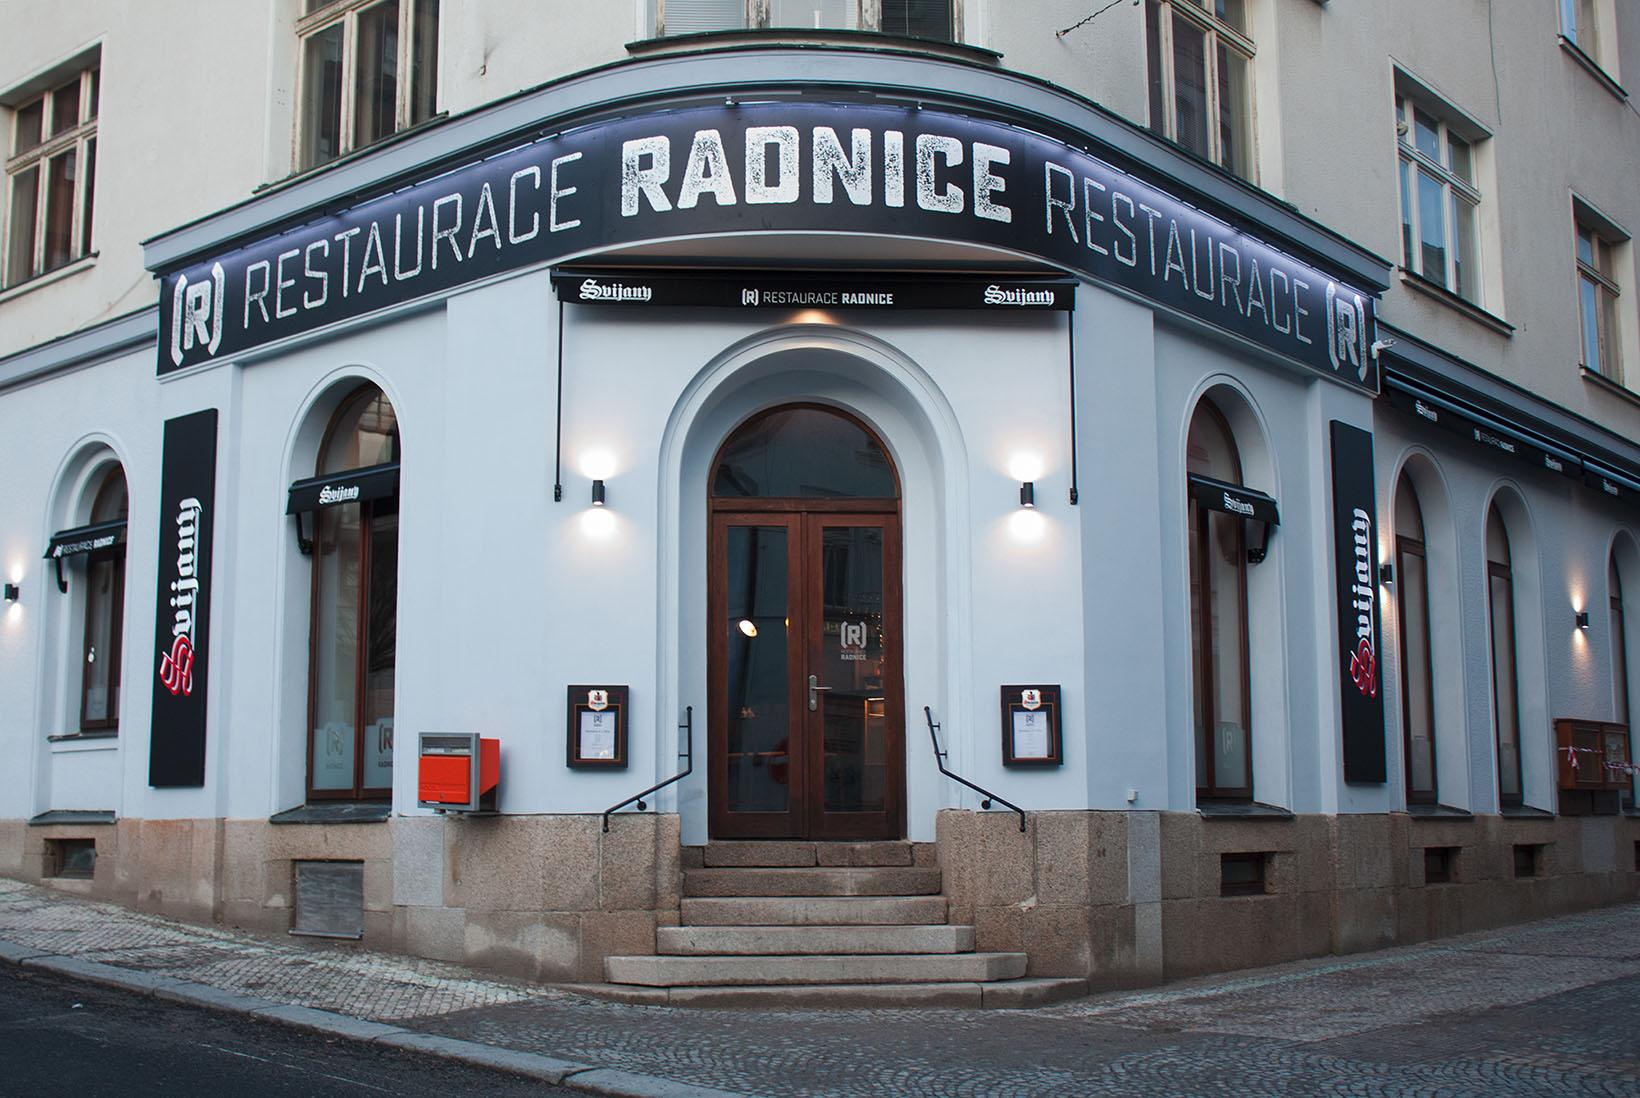 Radnice restaurace